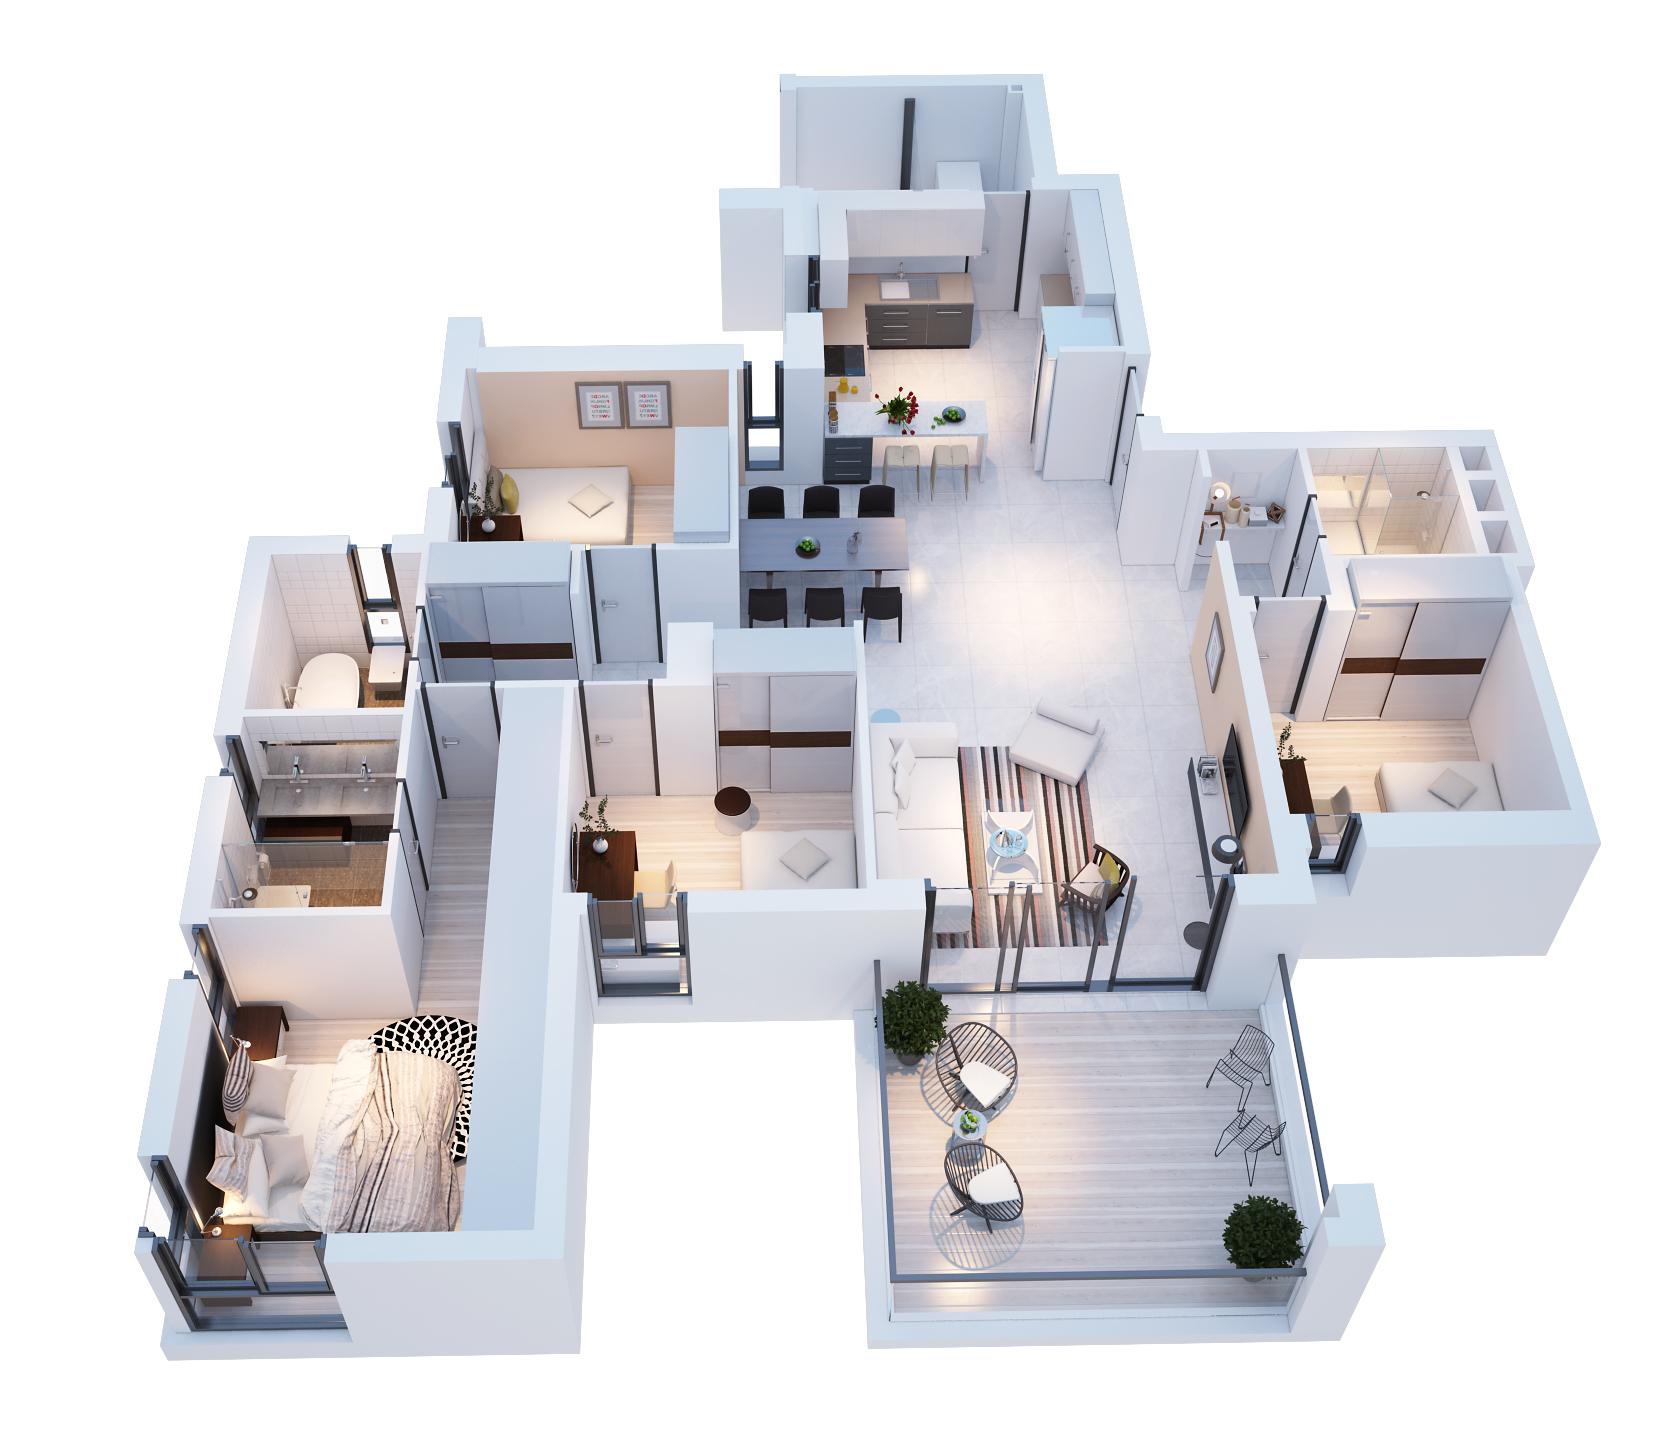 Architecture_Interior_Plans01.jpg